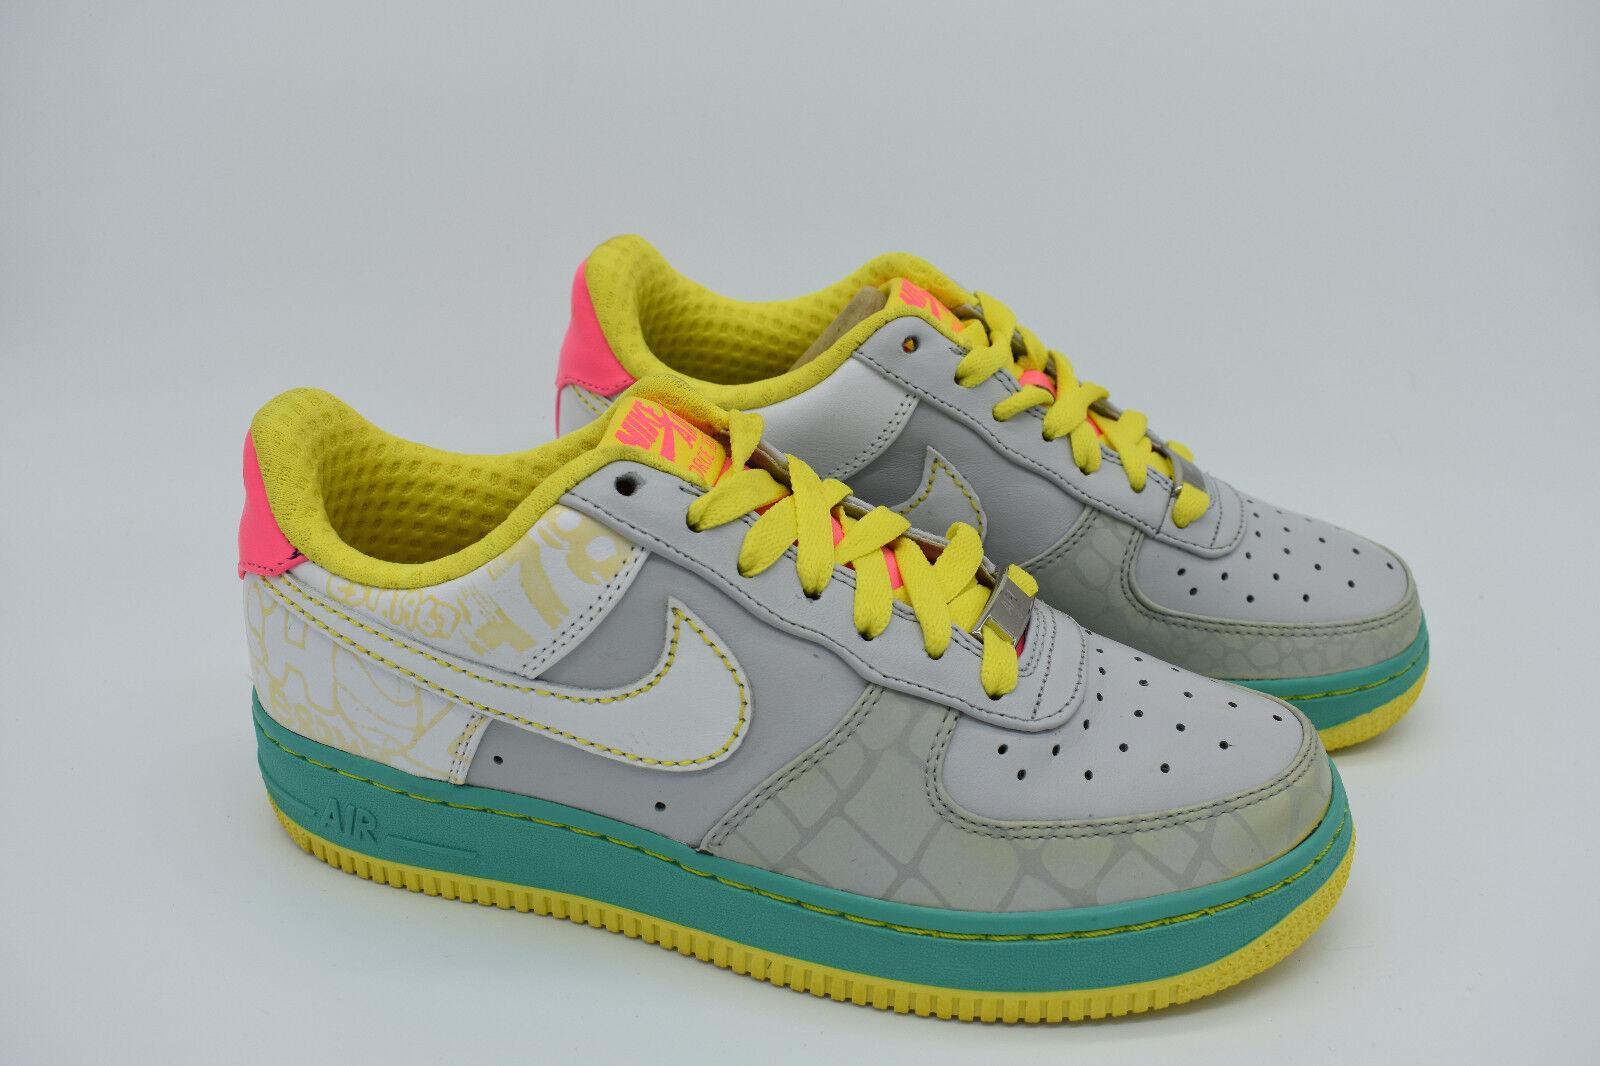 Nike Wmns Air Force 1 Premium Gauchos - Size 7 US